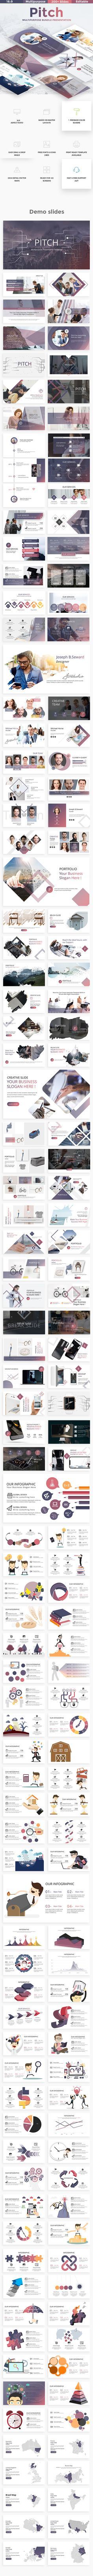 Pitch #Multipurpose #Google #Slide Template - Google Slides Presentation Templates